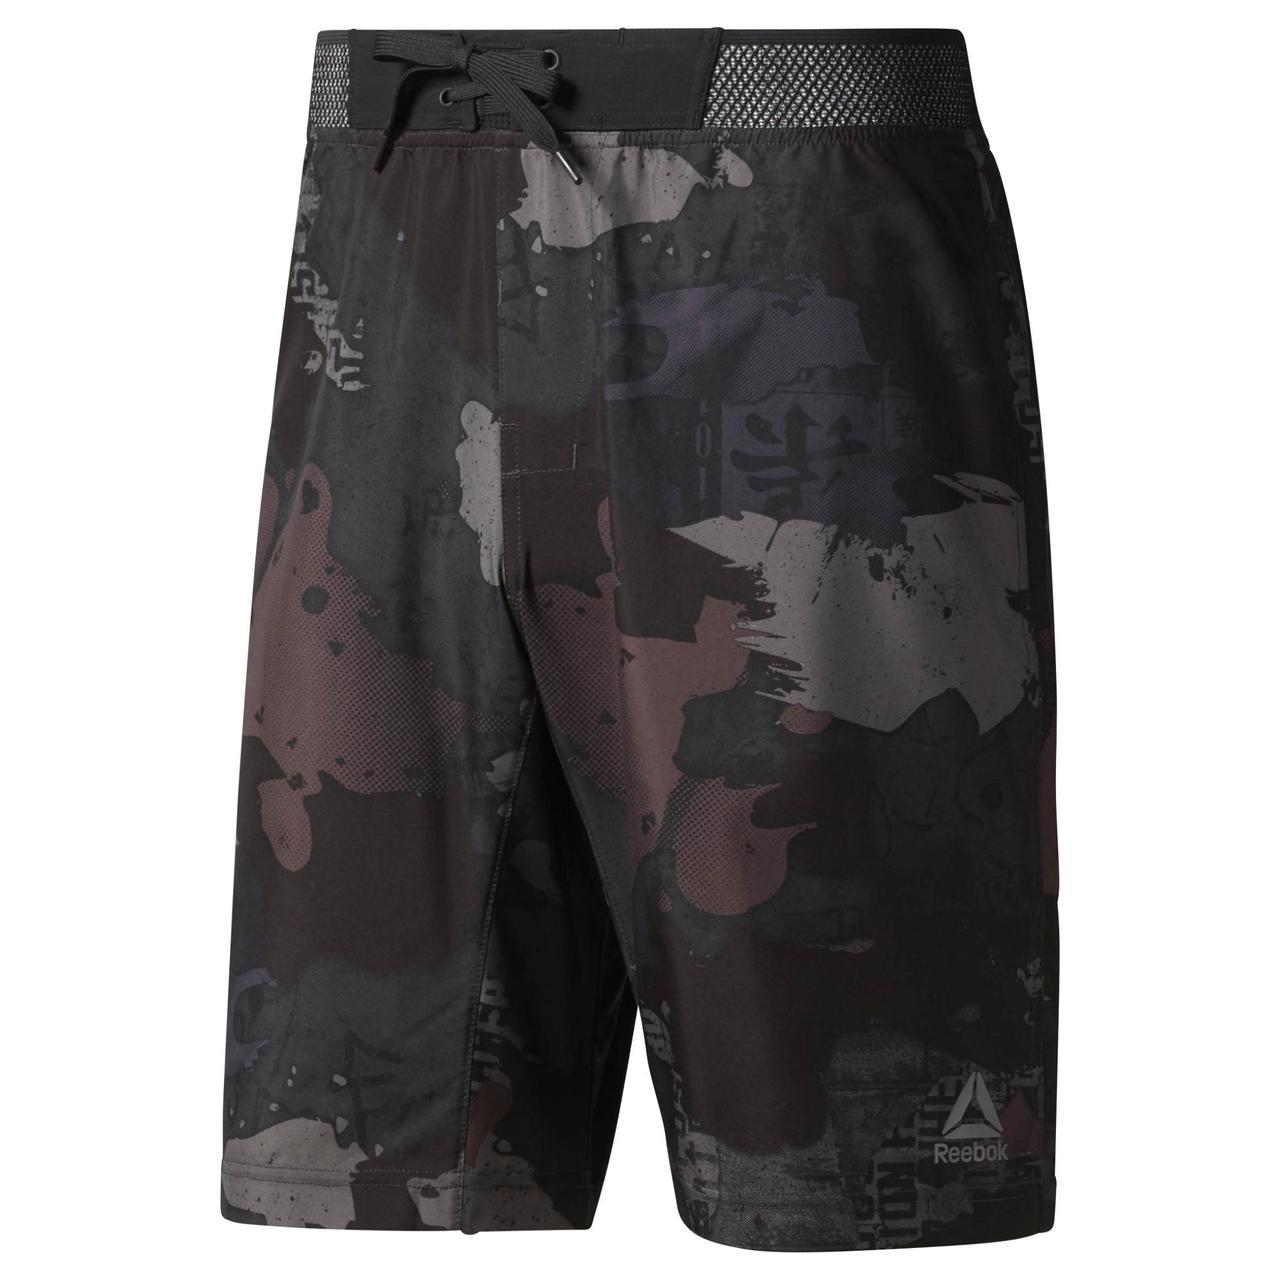 Мужские шорты Reebok Epic 2 In 1 (Артикул: D93802)